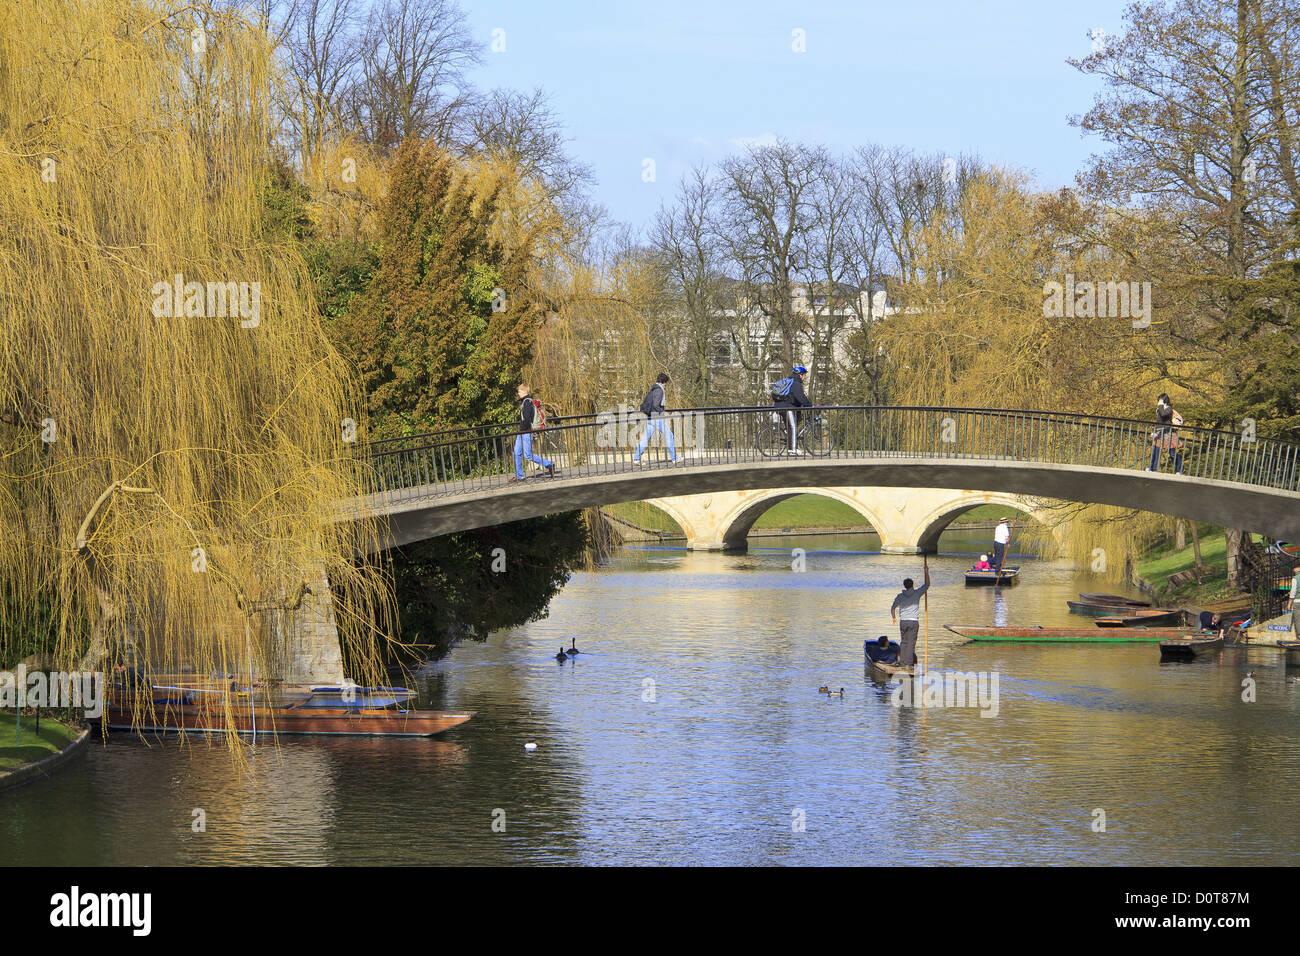 Cambridge Bridges Over The River Cam Stock Photo, Royalty ...